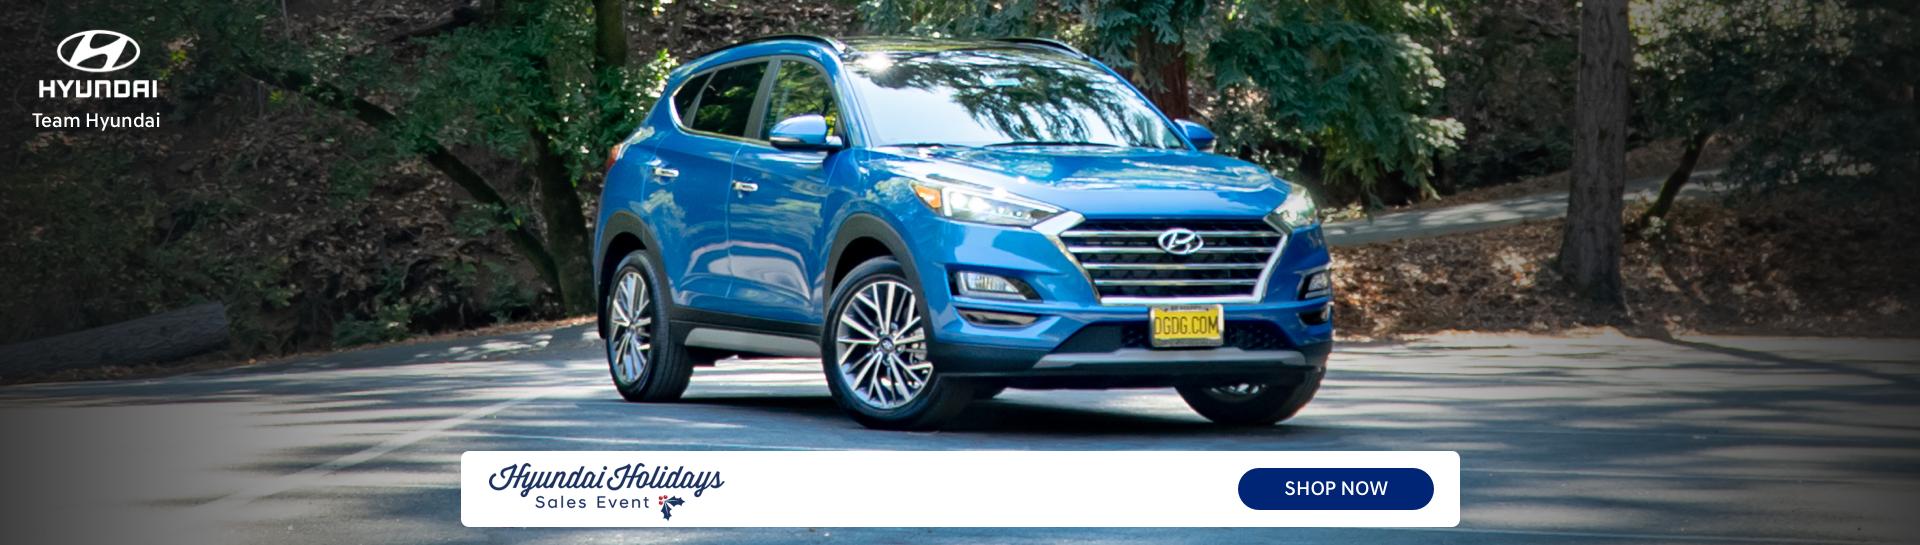 Team Hyundai Holidays Sales Event